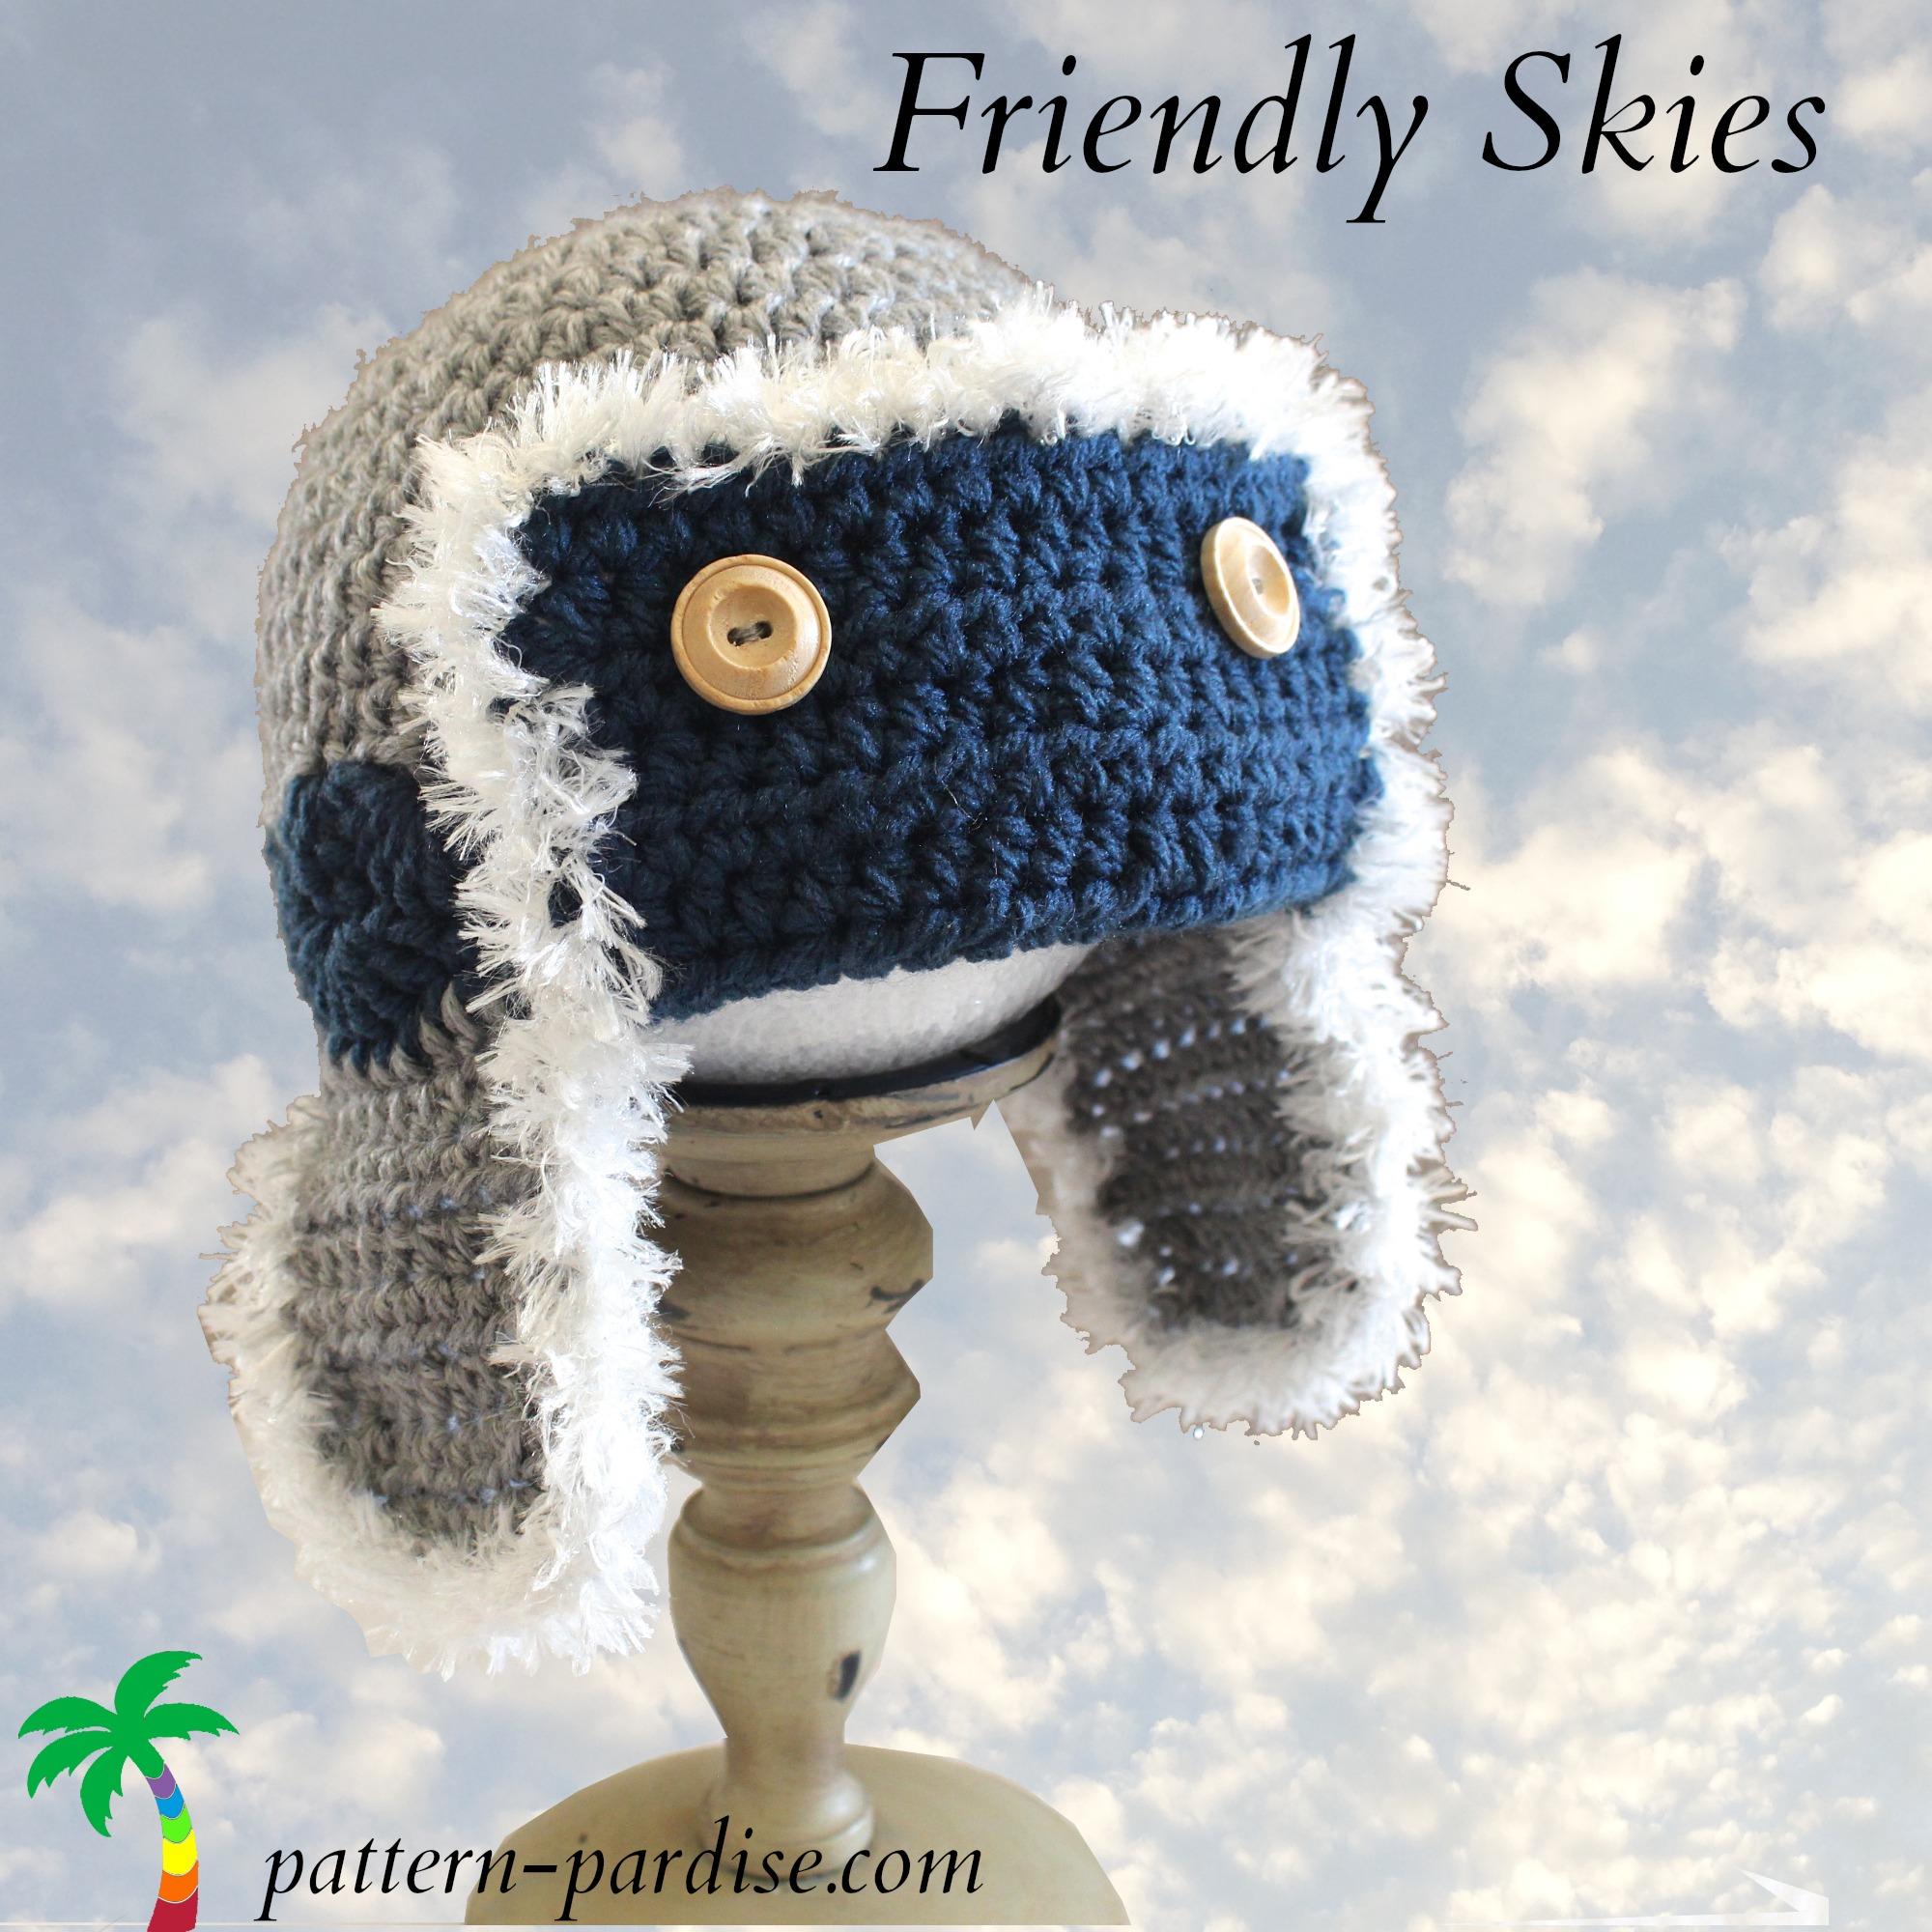 FREE Crochet Pattern - Friendly Skies Hat! | Pattern Paradise